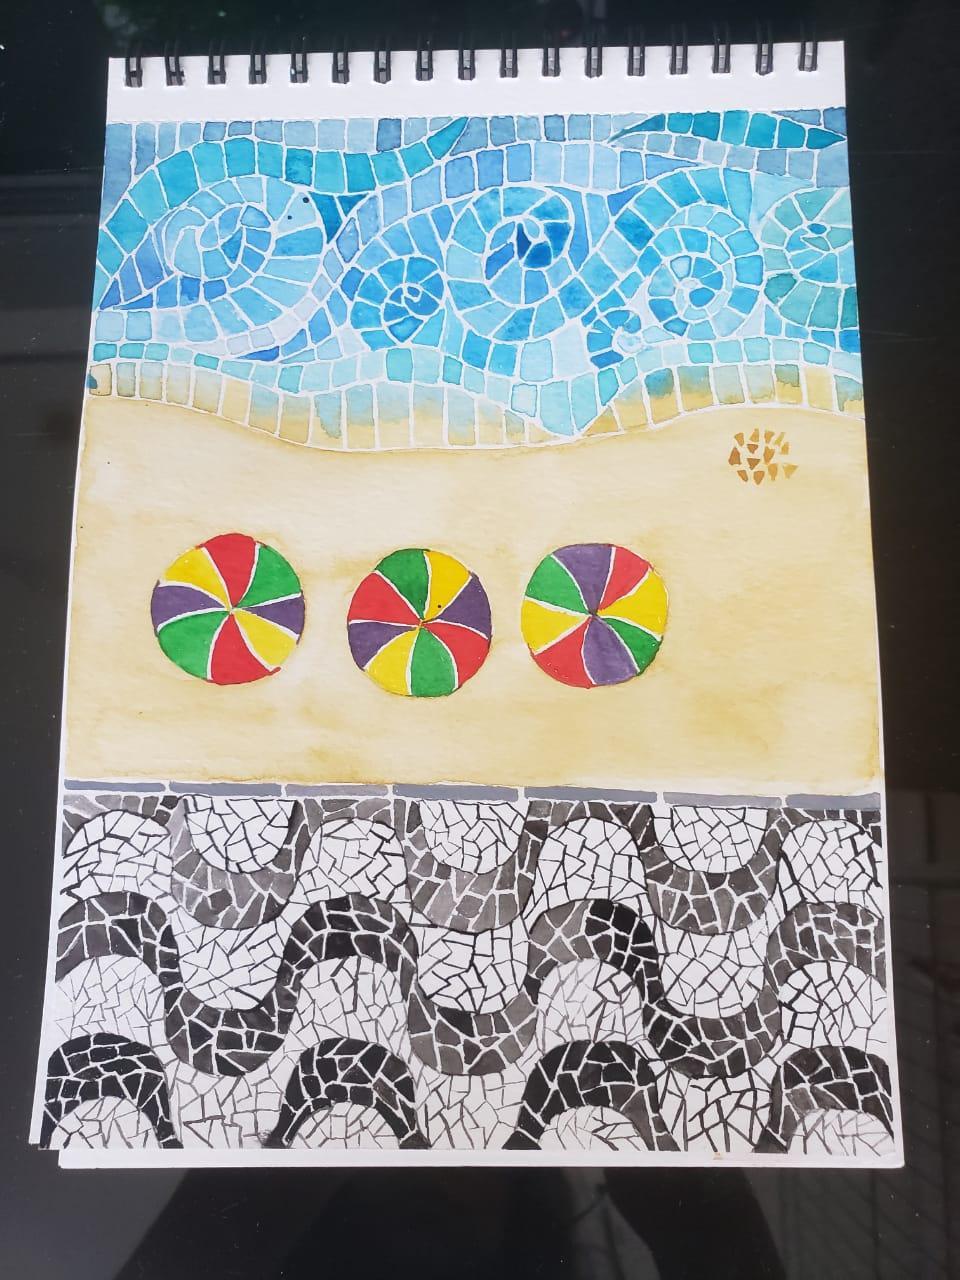 Copacabana - image 1 - student project